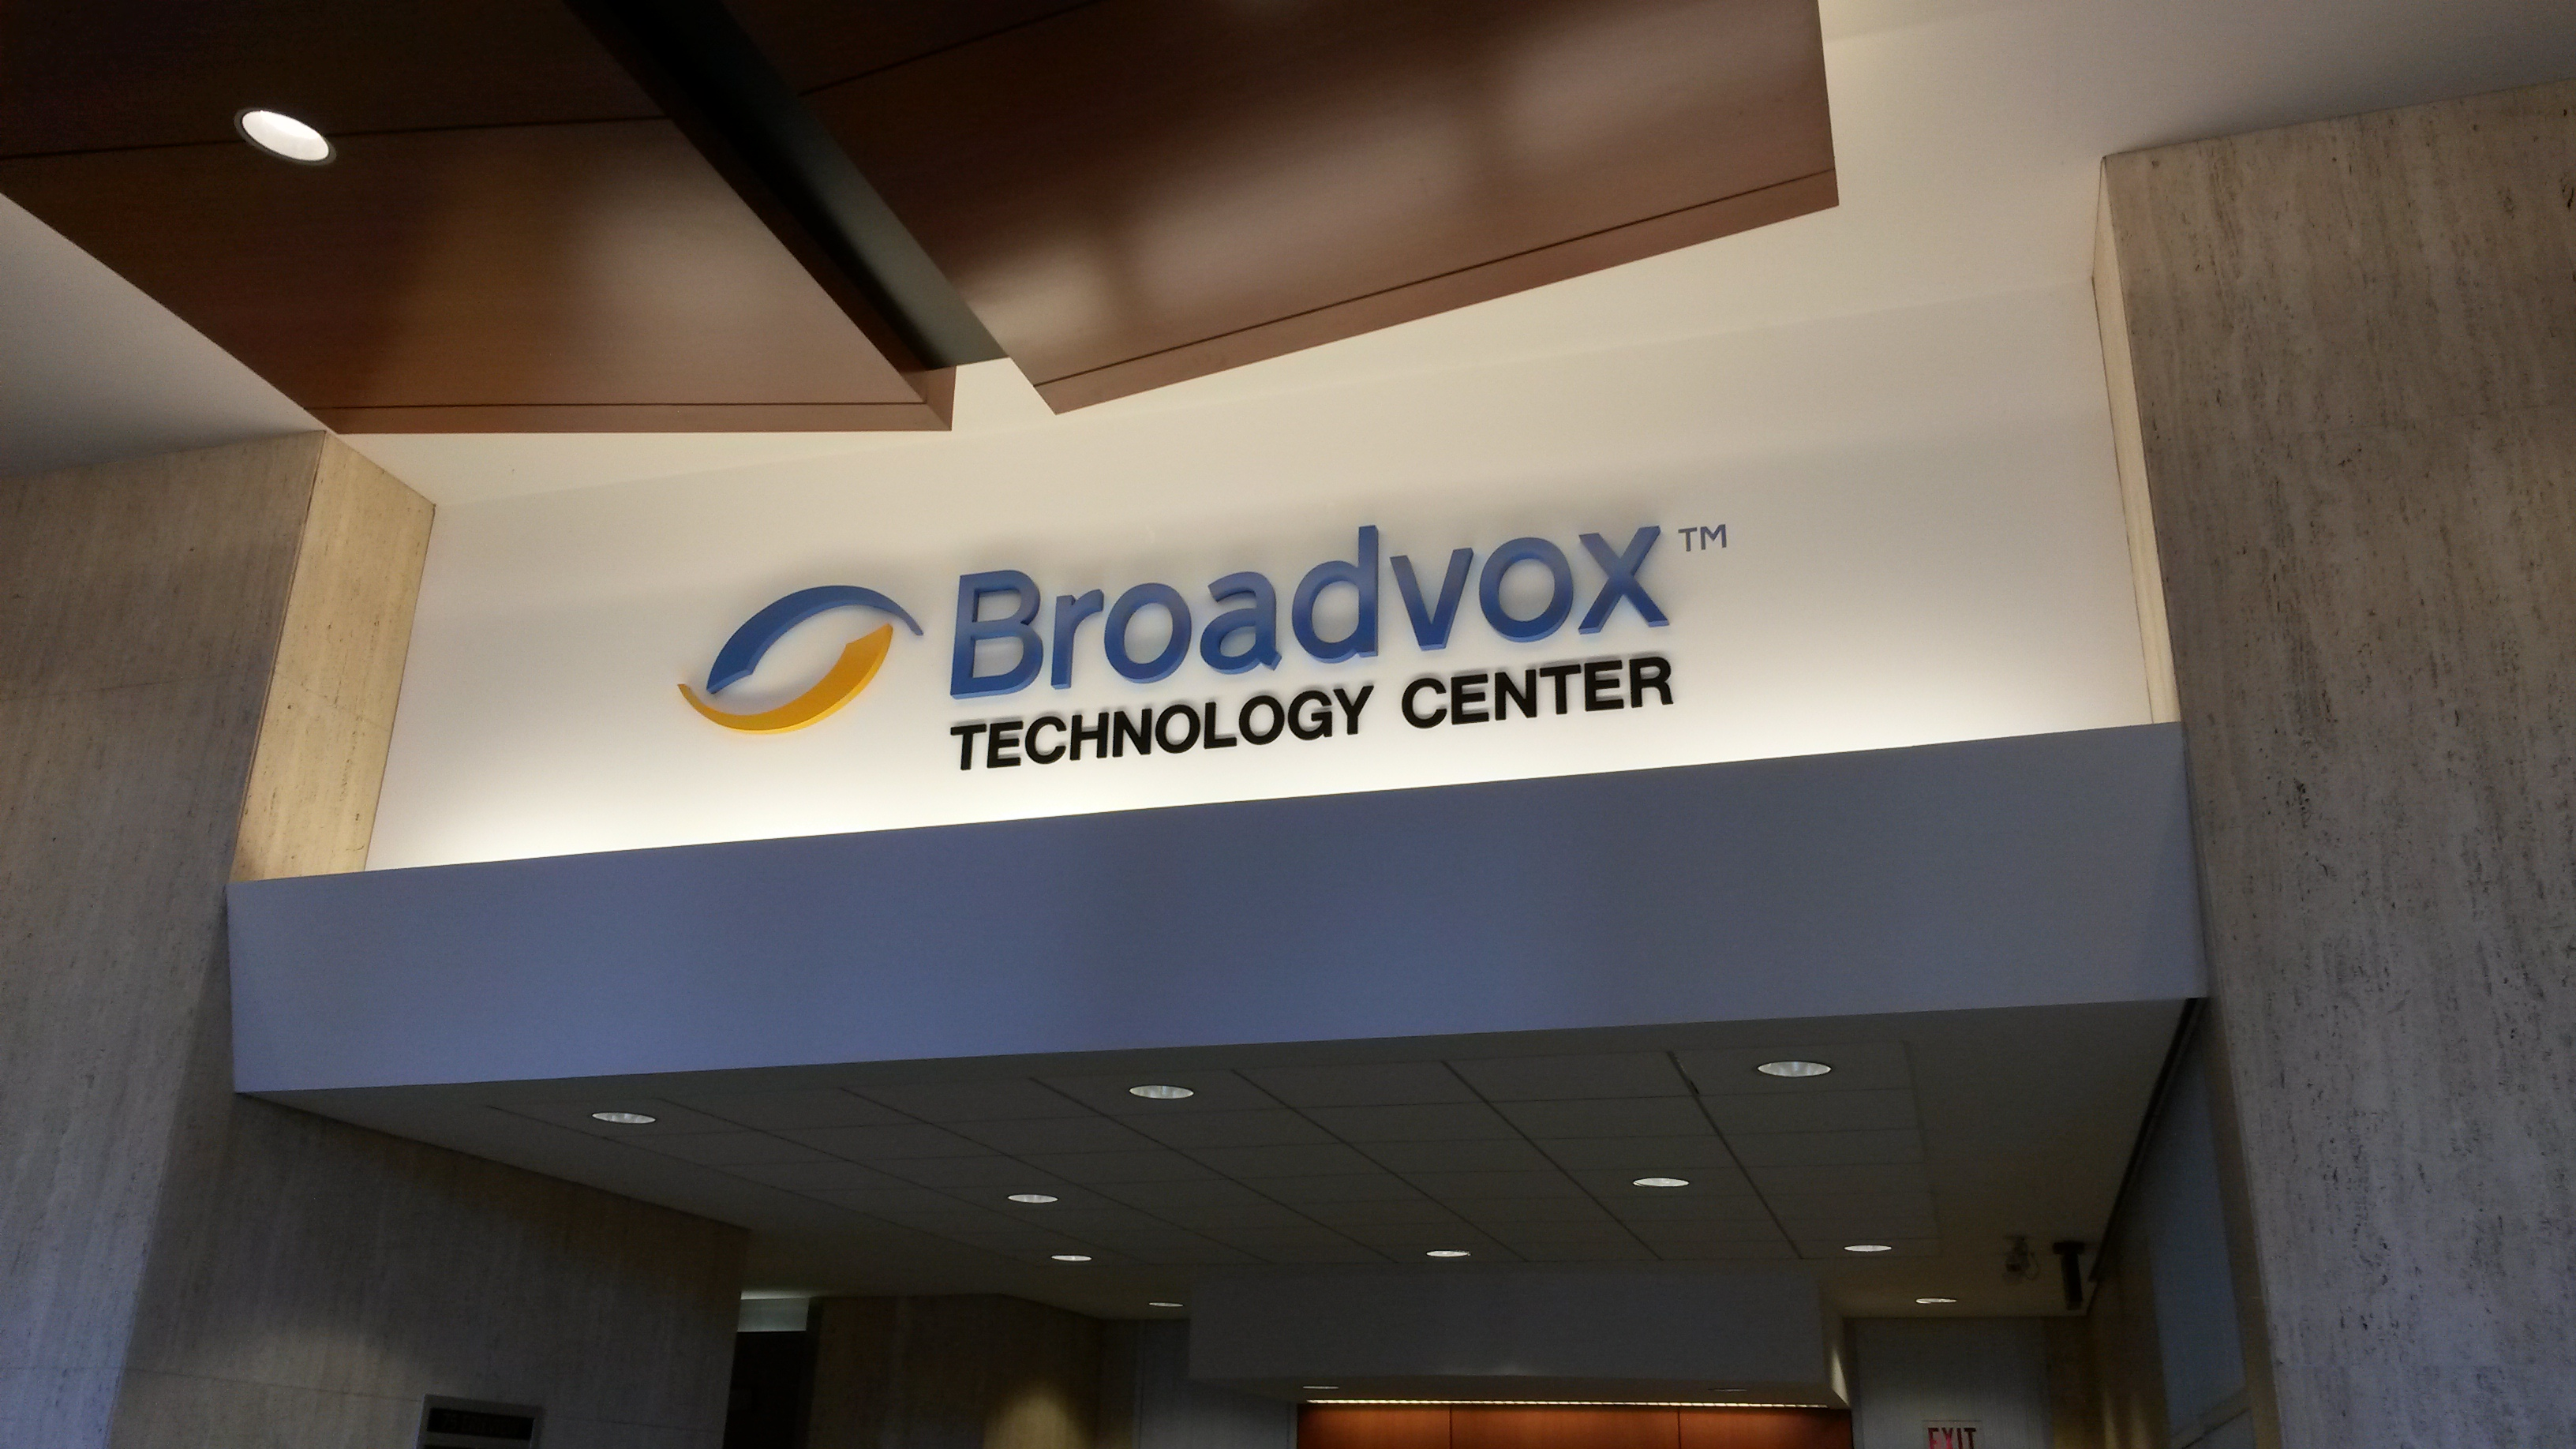 Broadvox lobby wall sign